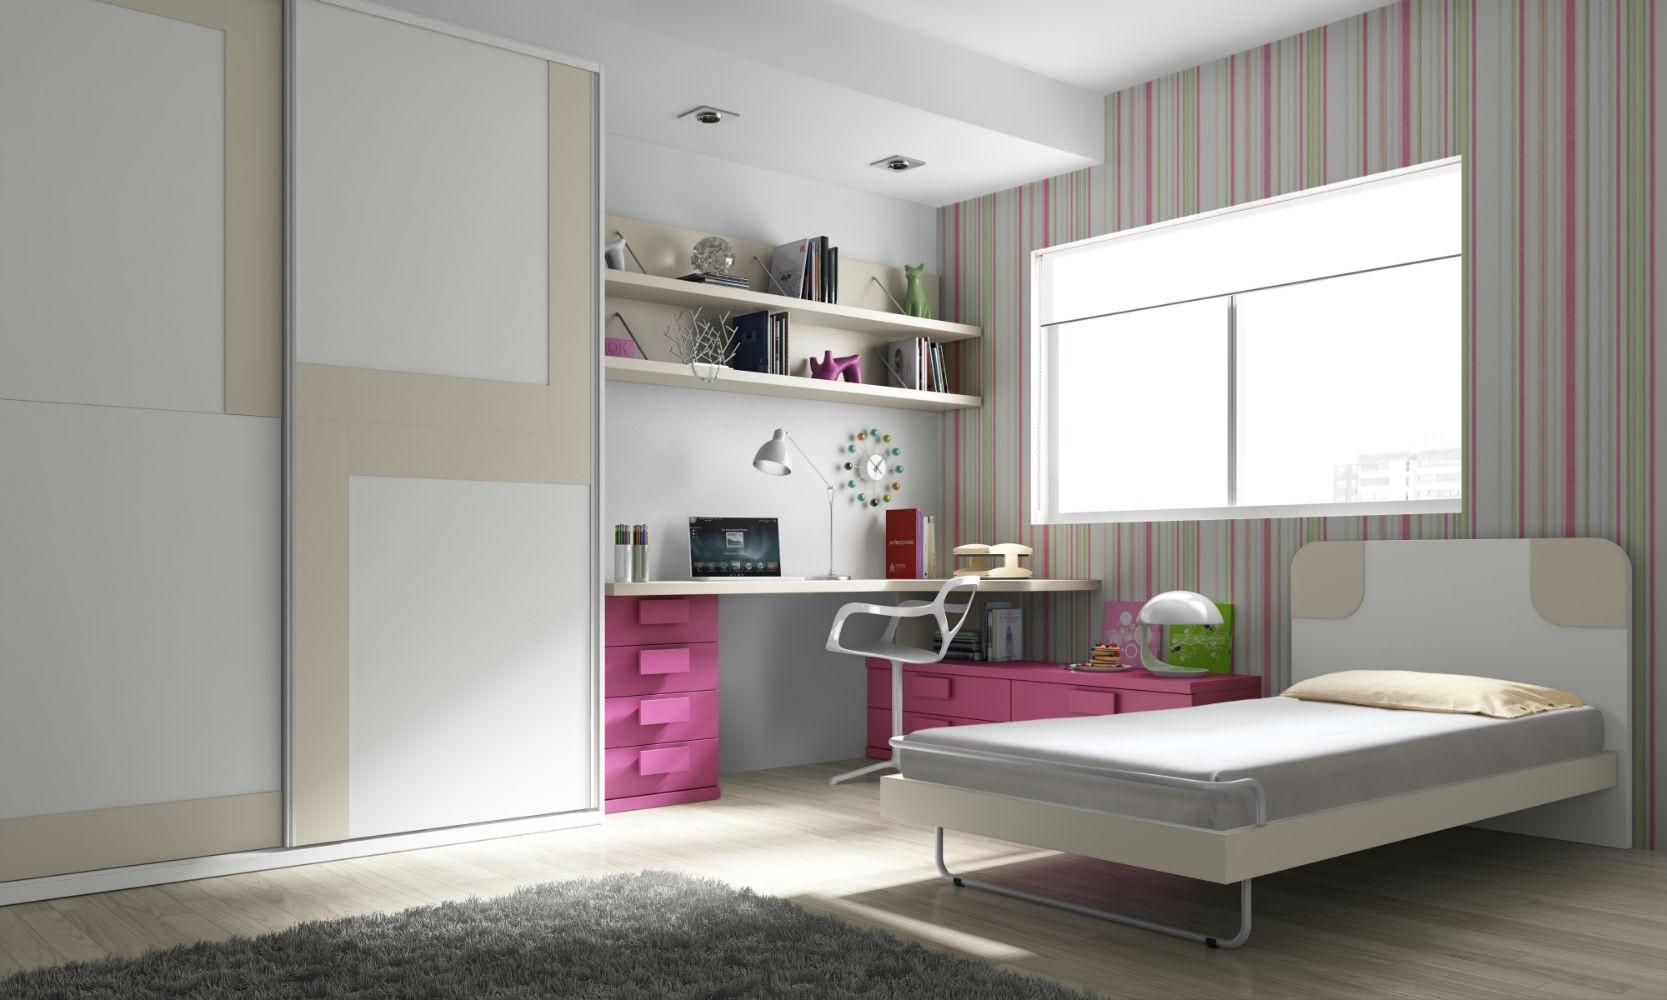 Dormitorio juvenil infantil moderno color roble blanco for Muebles dormitorio infantil juvenil